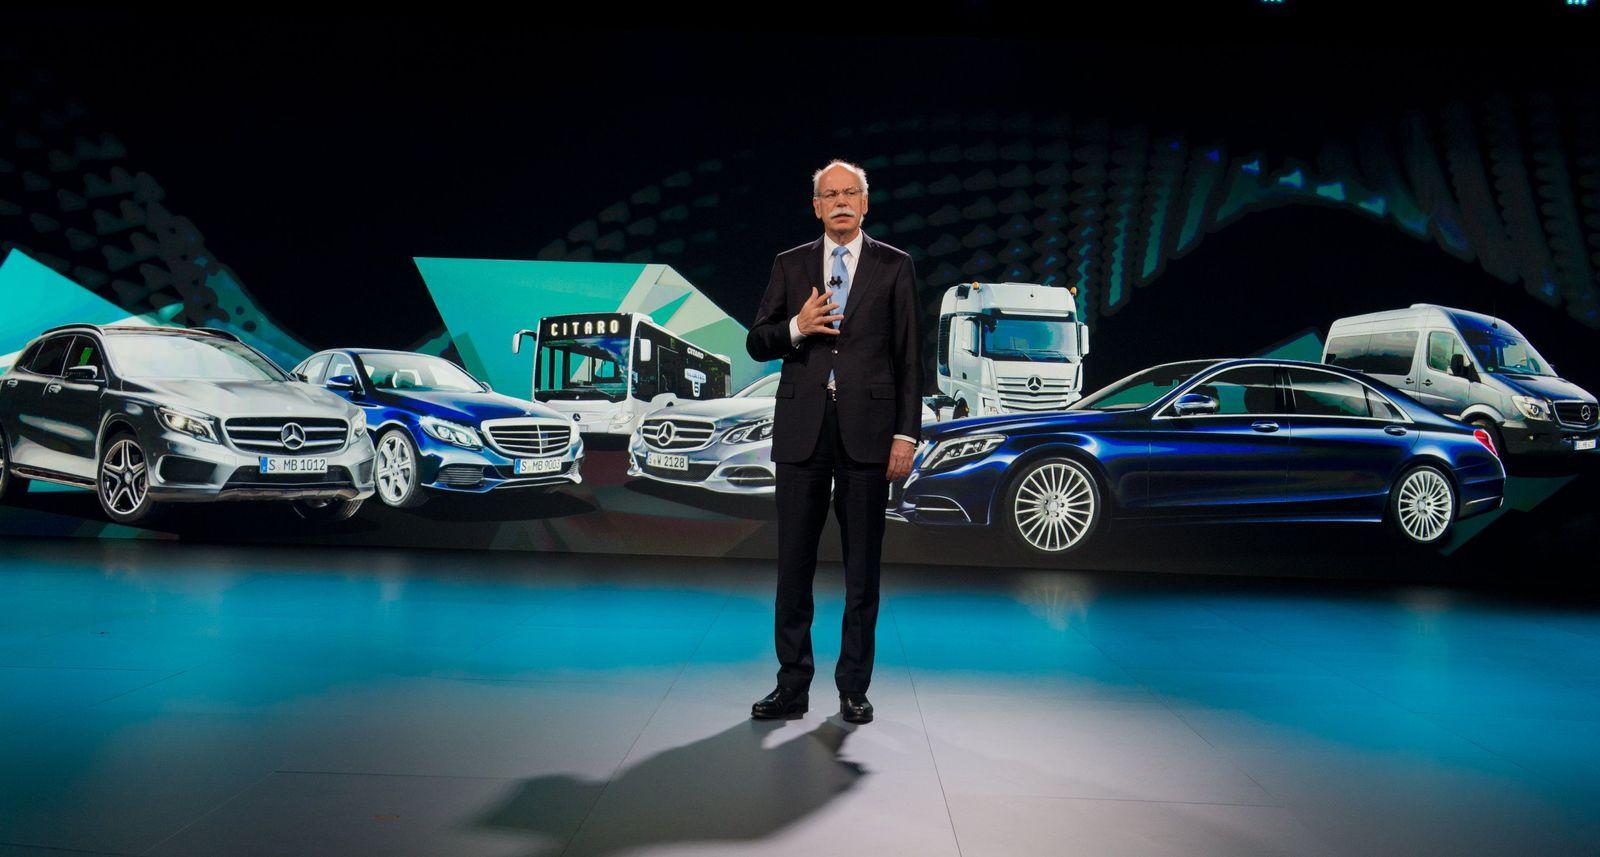 Zetsche / Daimler / Mercedes V-Klasse